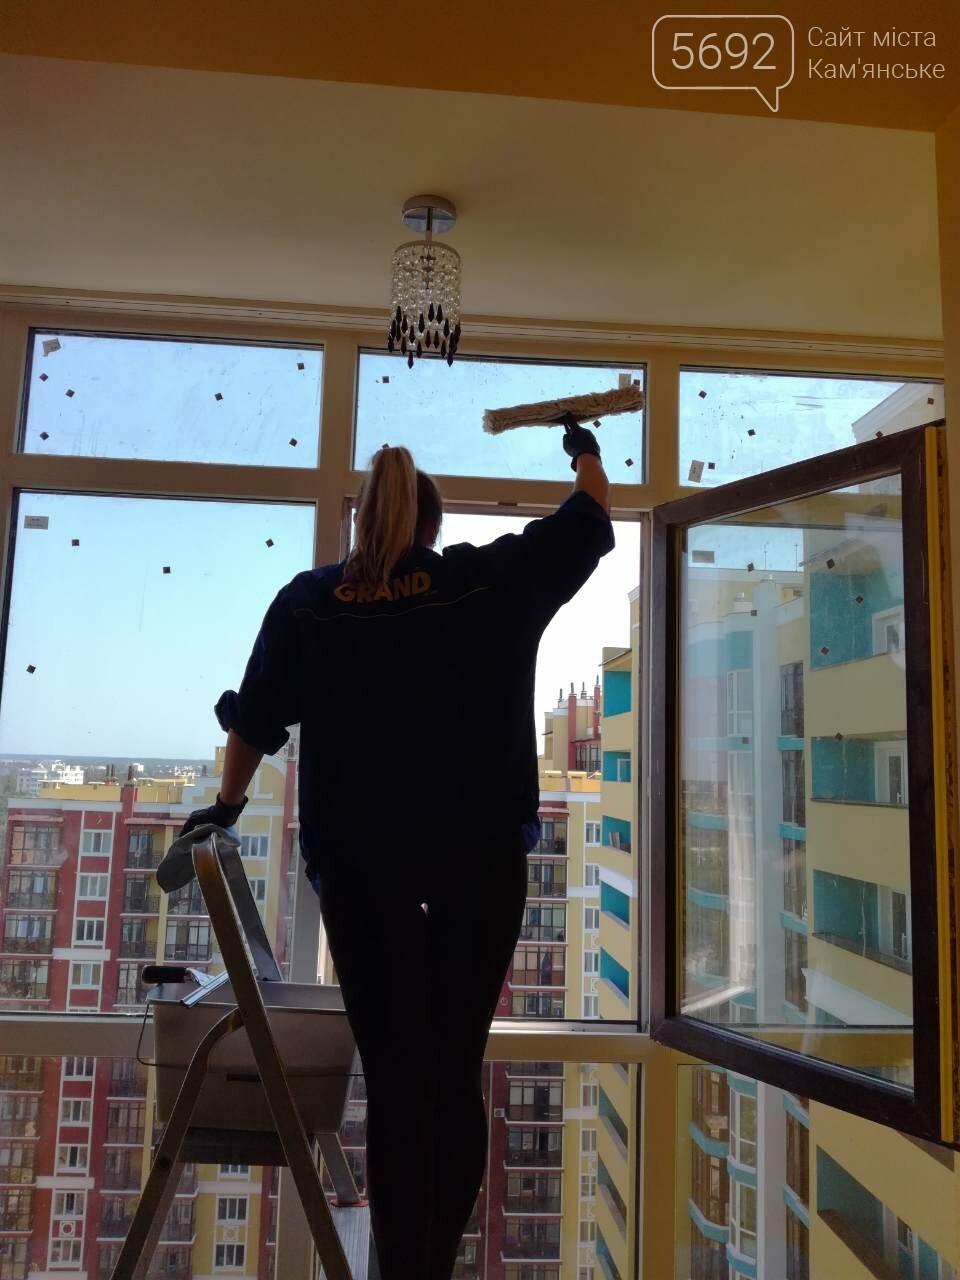 Качественная уборка дома, квартиры, офиса, фото-4